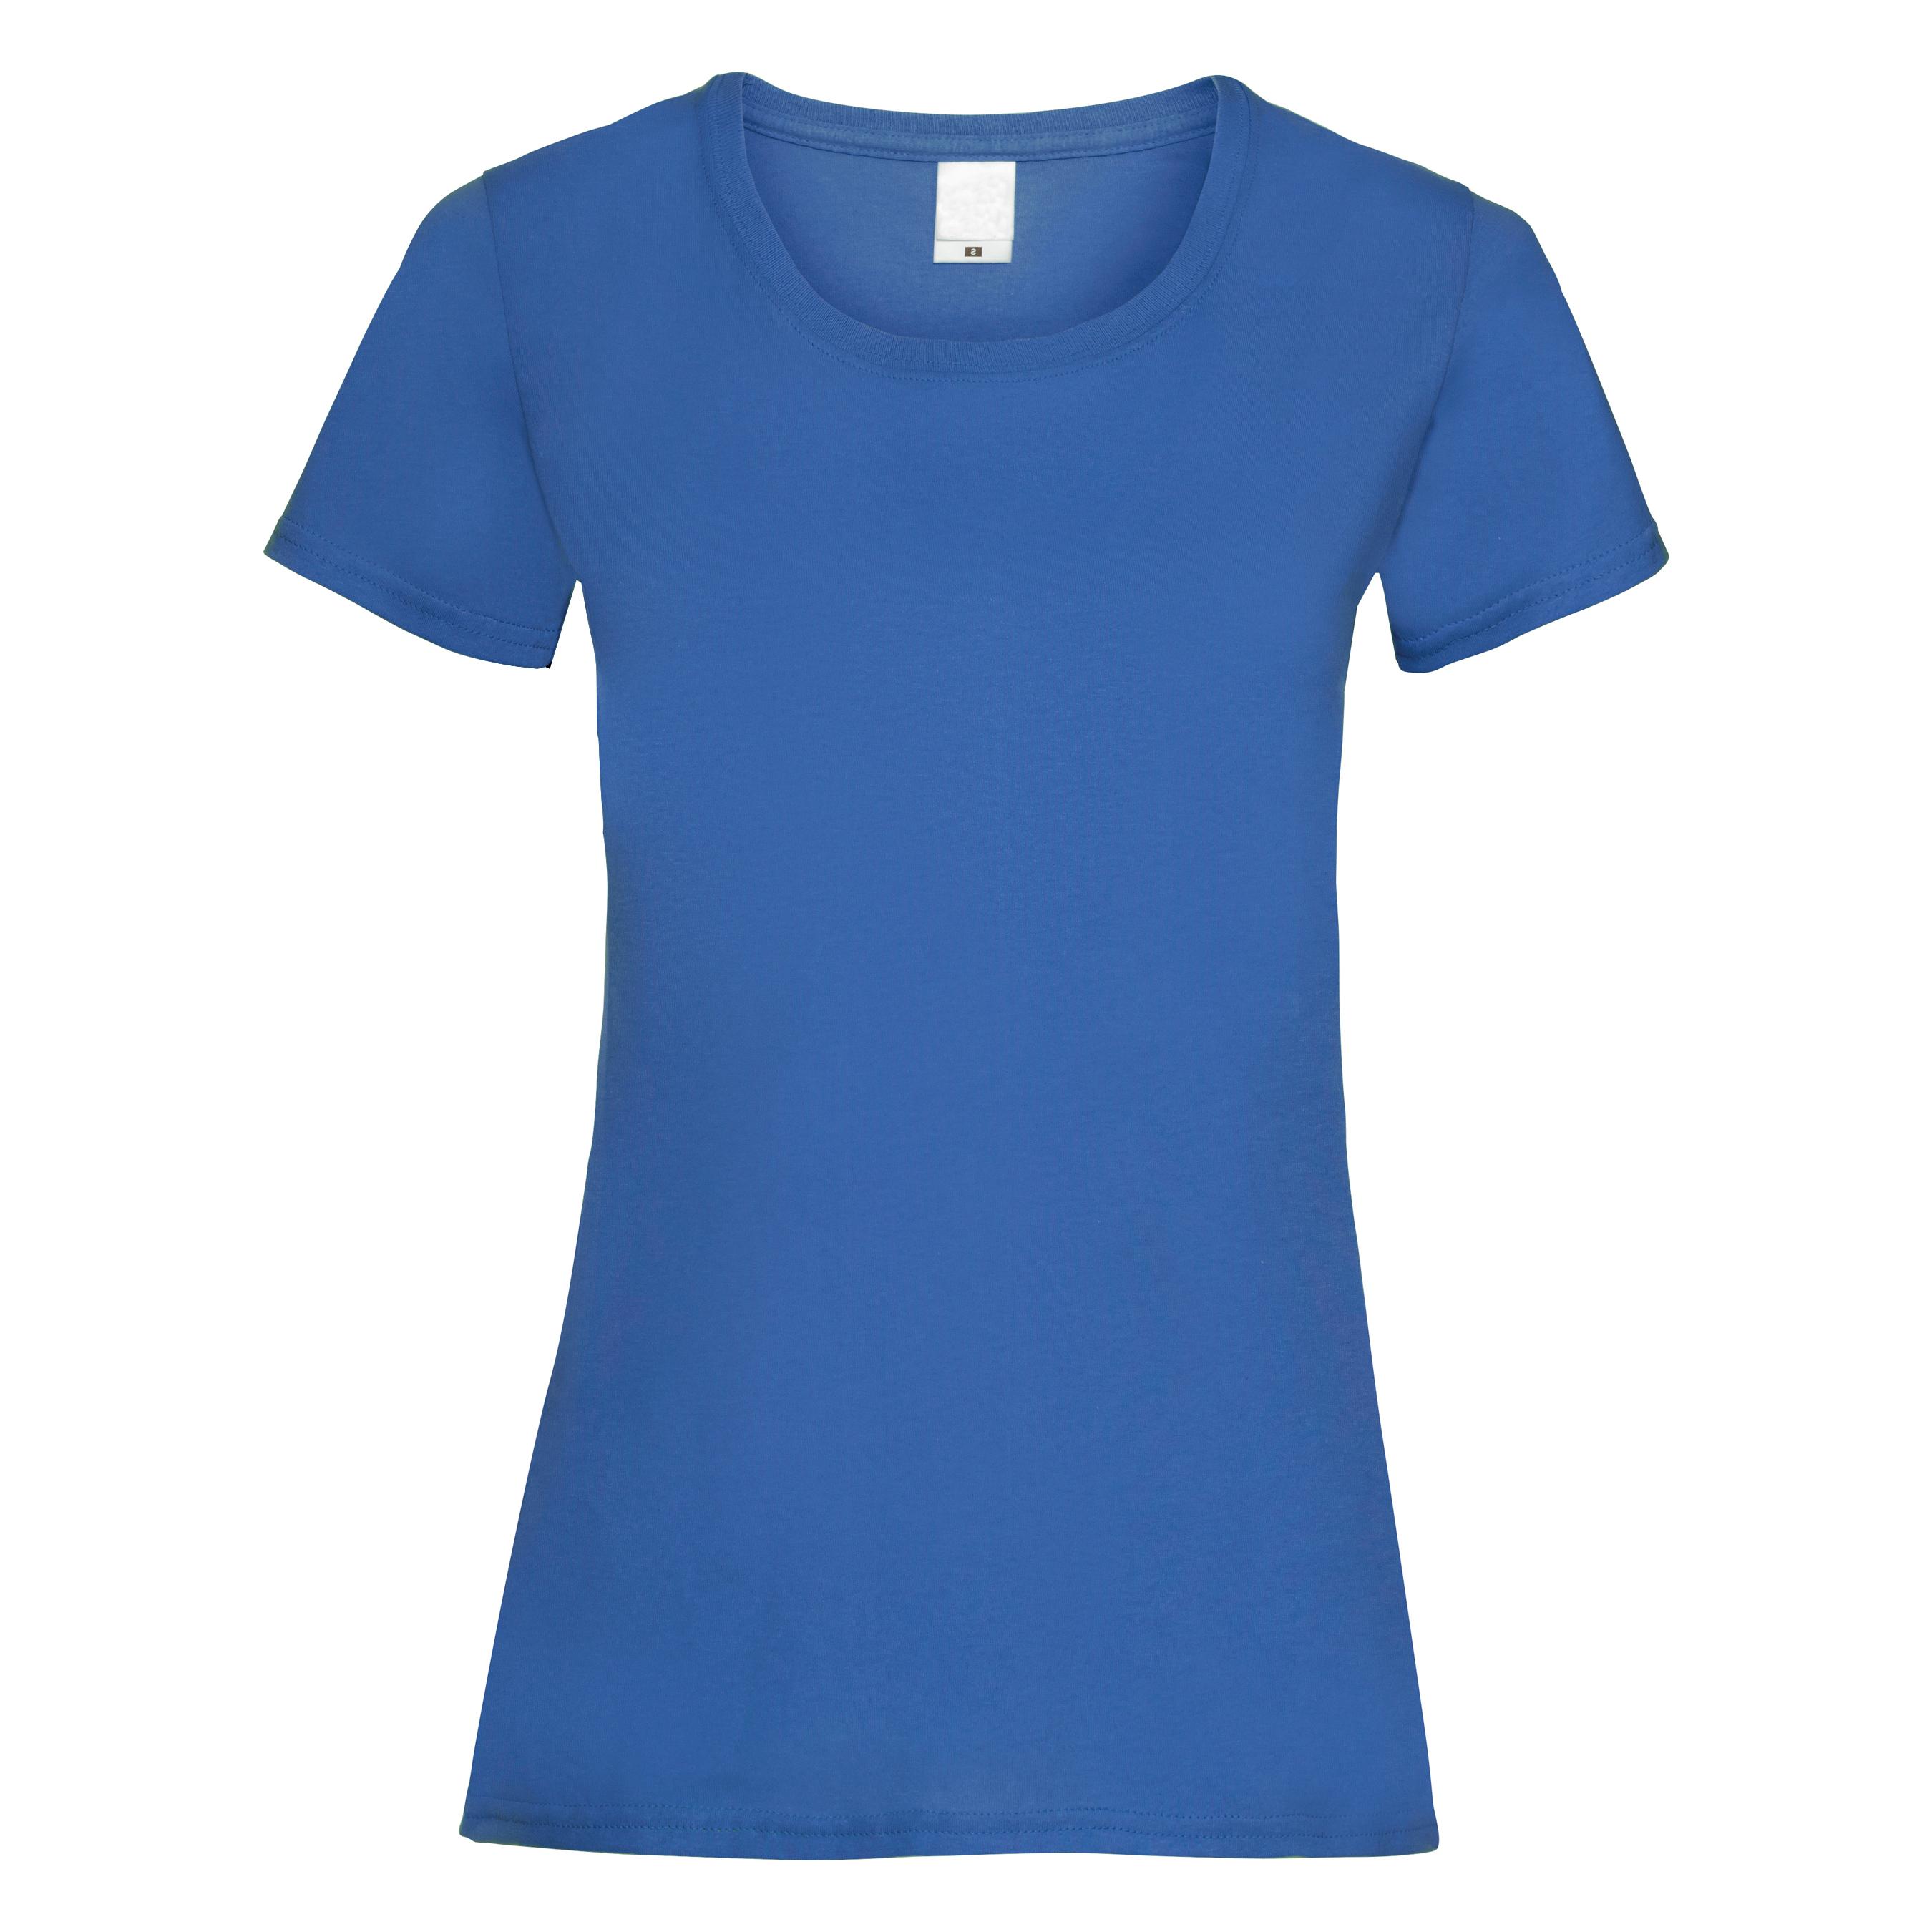 Womens/Ladies Value Fitted Short Sleeve Casual T-Shirt (Medium) (Midnight Blue)